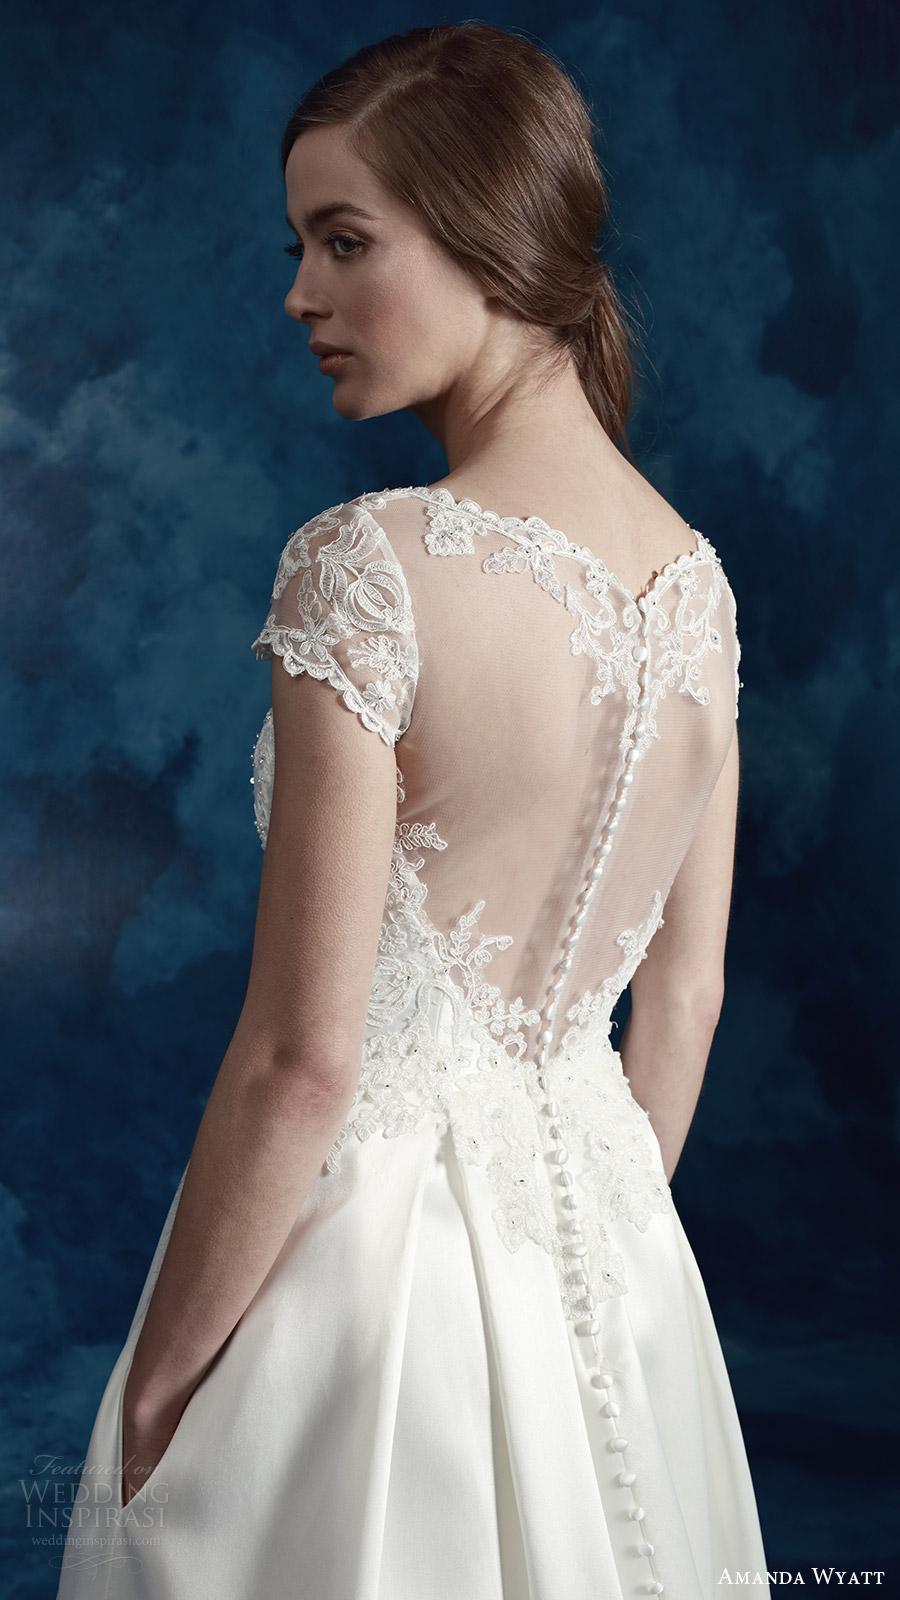 amanda wyatt bridal 2017 cap sleeves sweetheart illusion jewel a line wedding dress (wren) zbv pockets train illusion back romantic